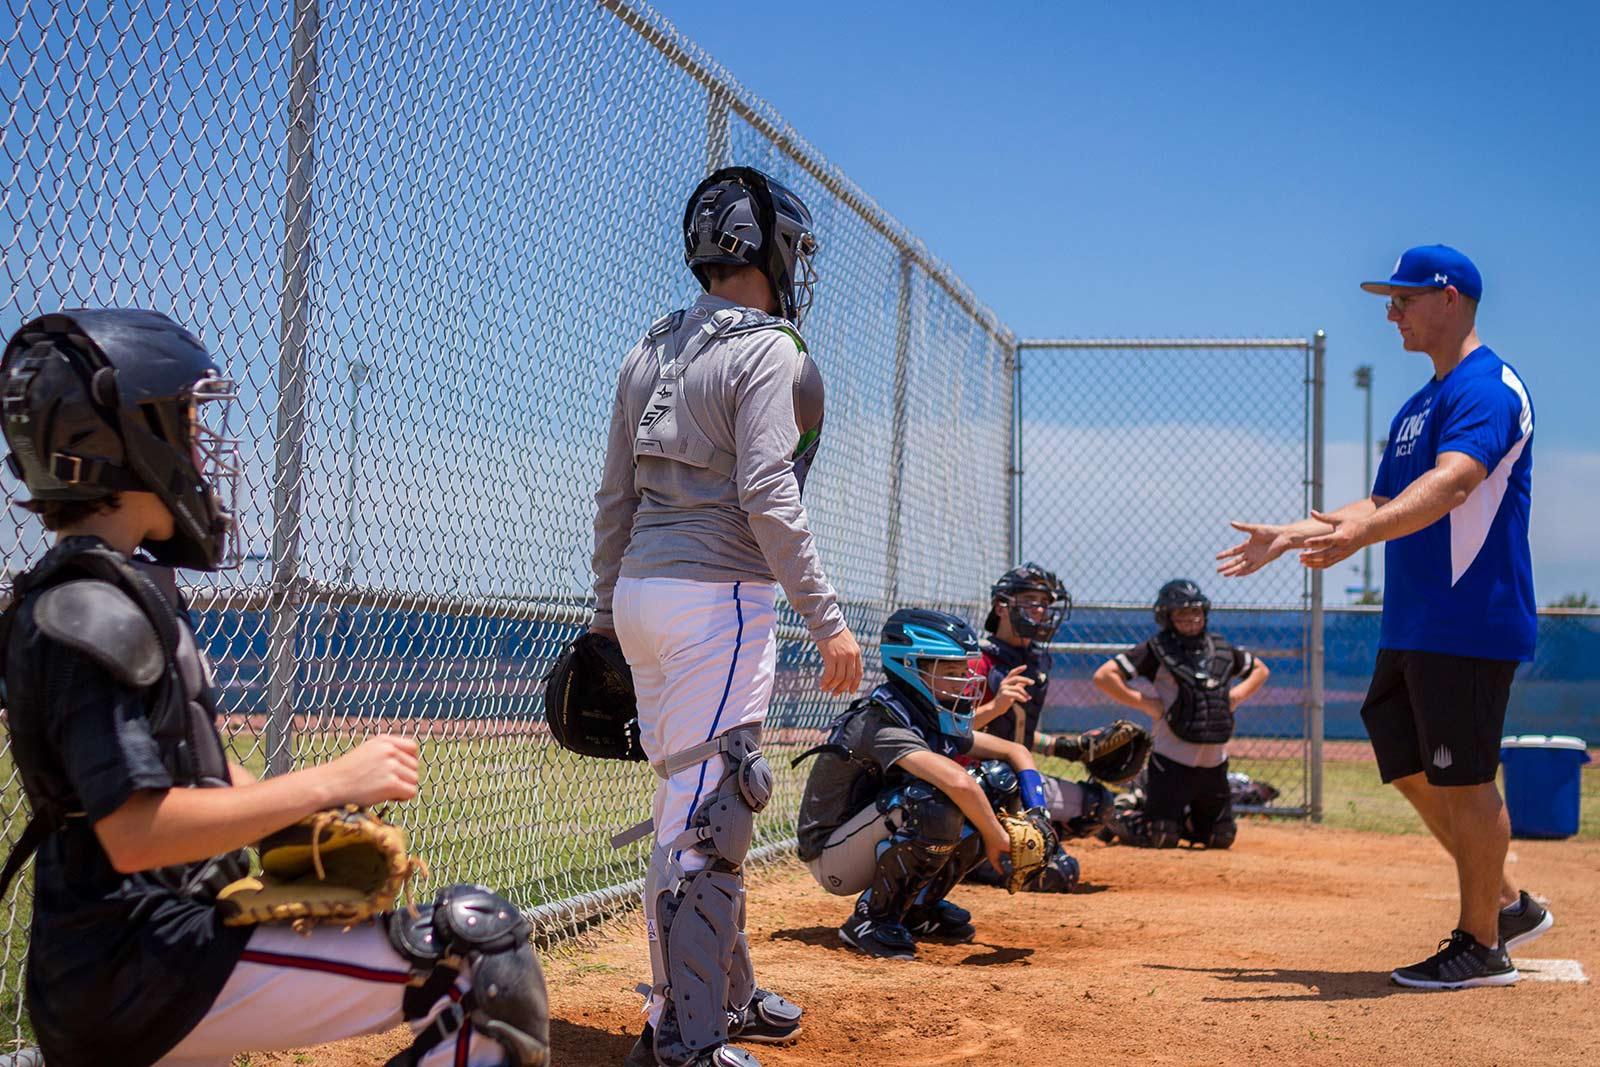 2019 Youth Baseball Camps - Baseball Training Camp | IMG Academy